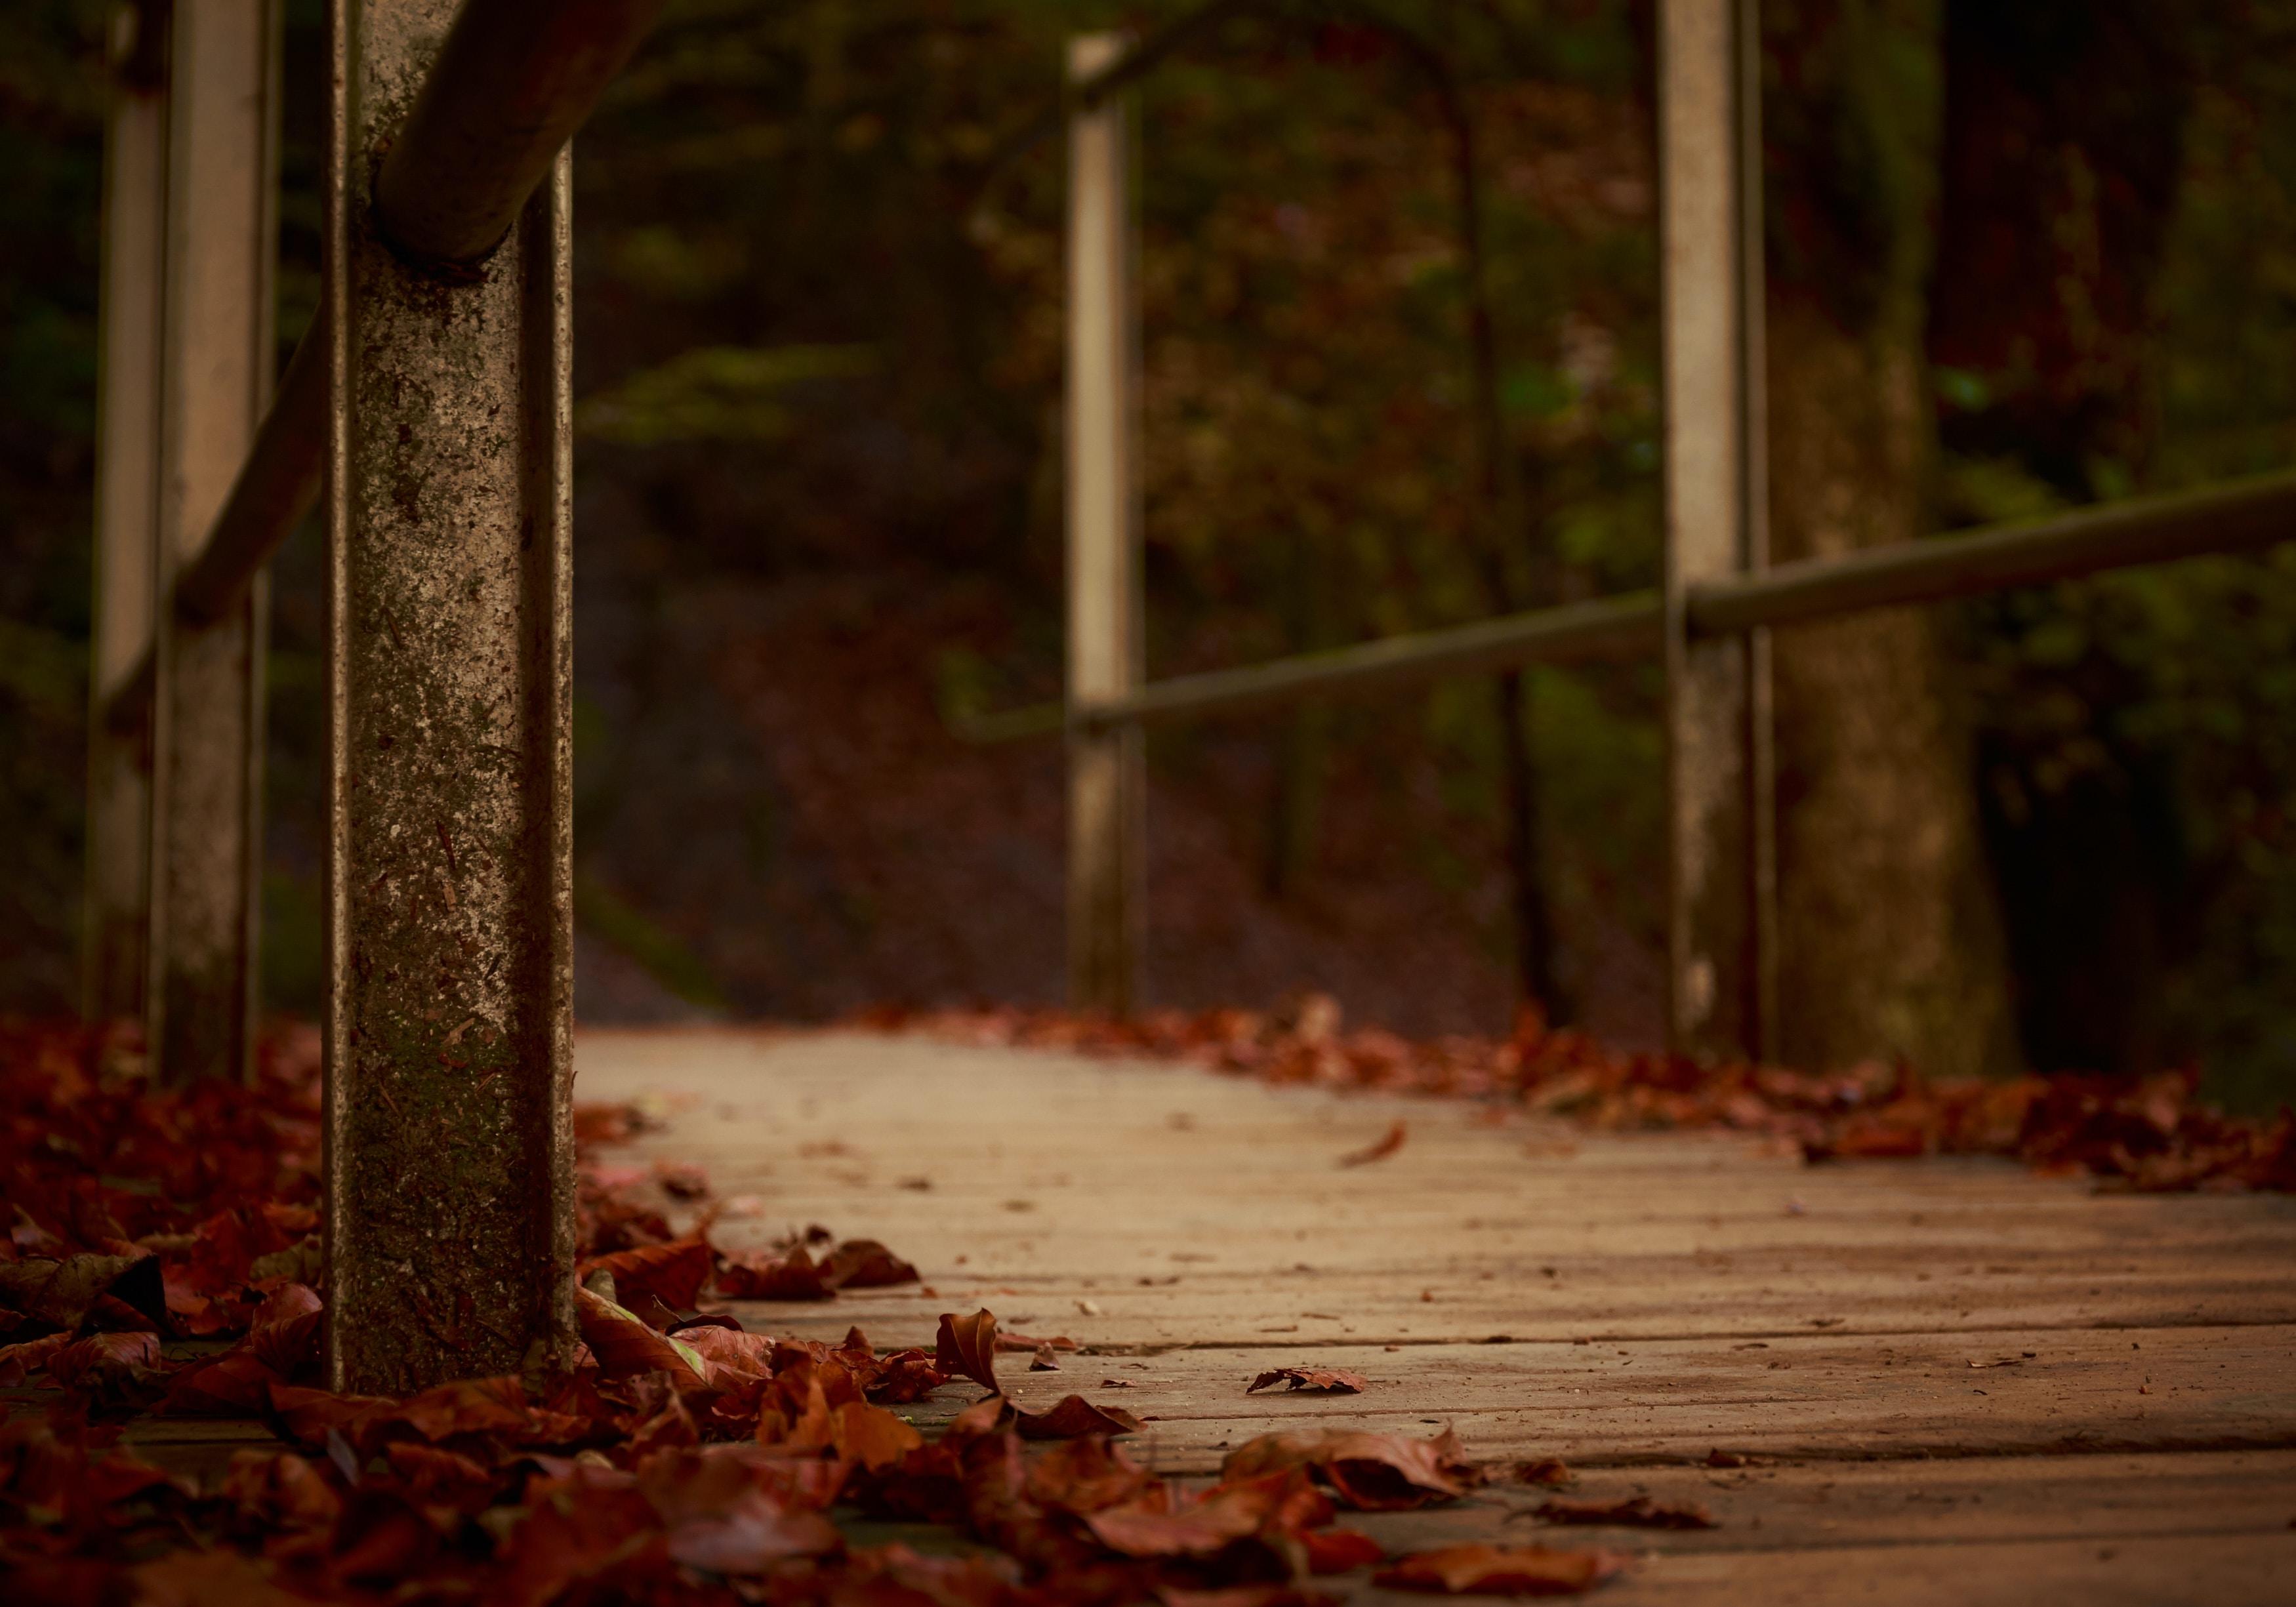 A close up shot of the leaf covered walking path and bridge at Gorges de la Jogne